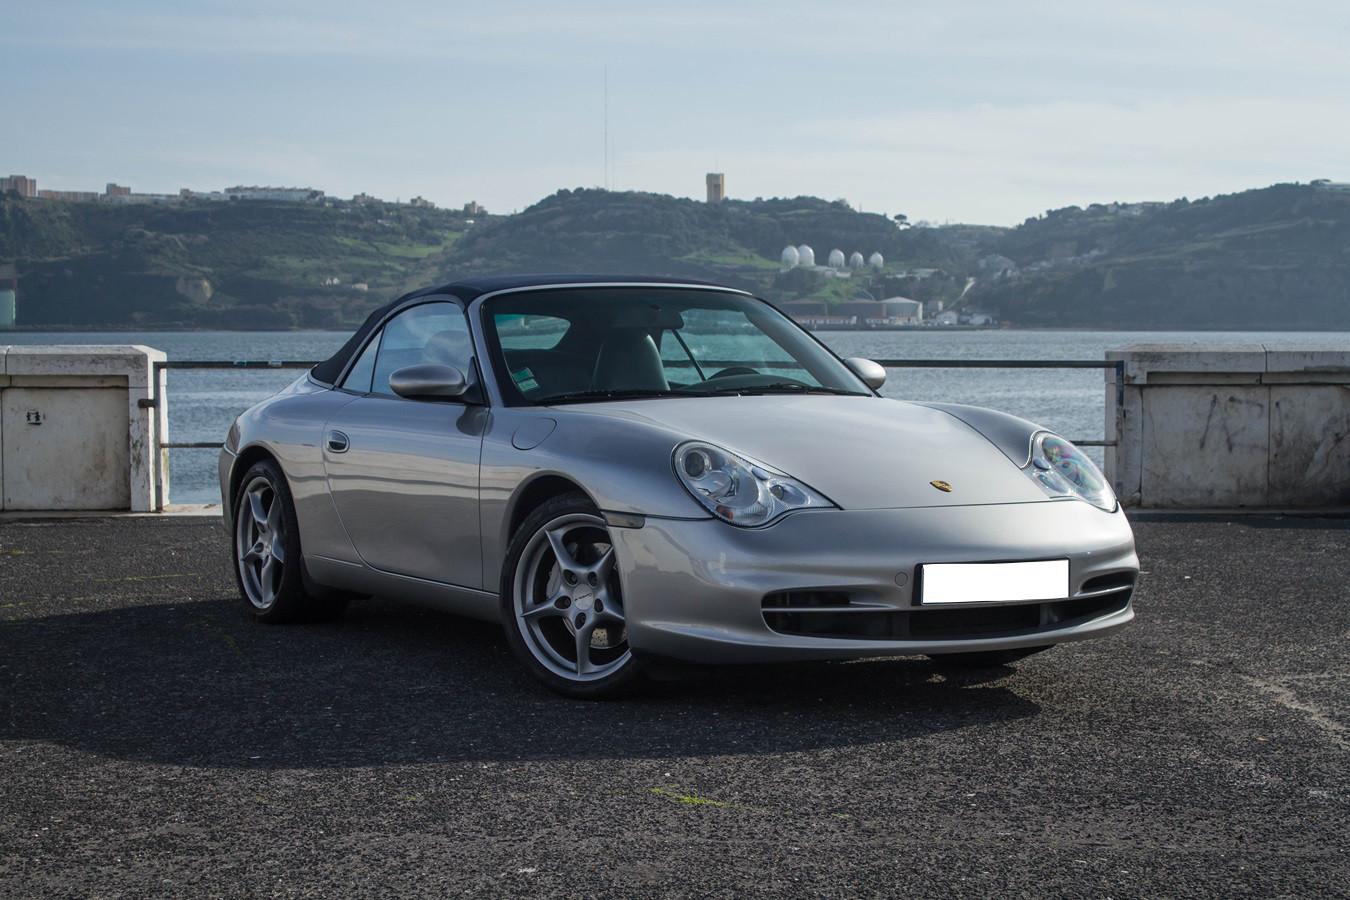 Porsche 911 Carrera 4 Cabrio (2001)